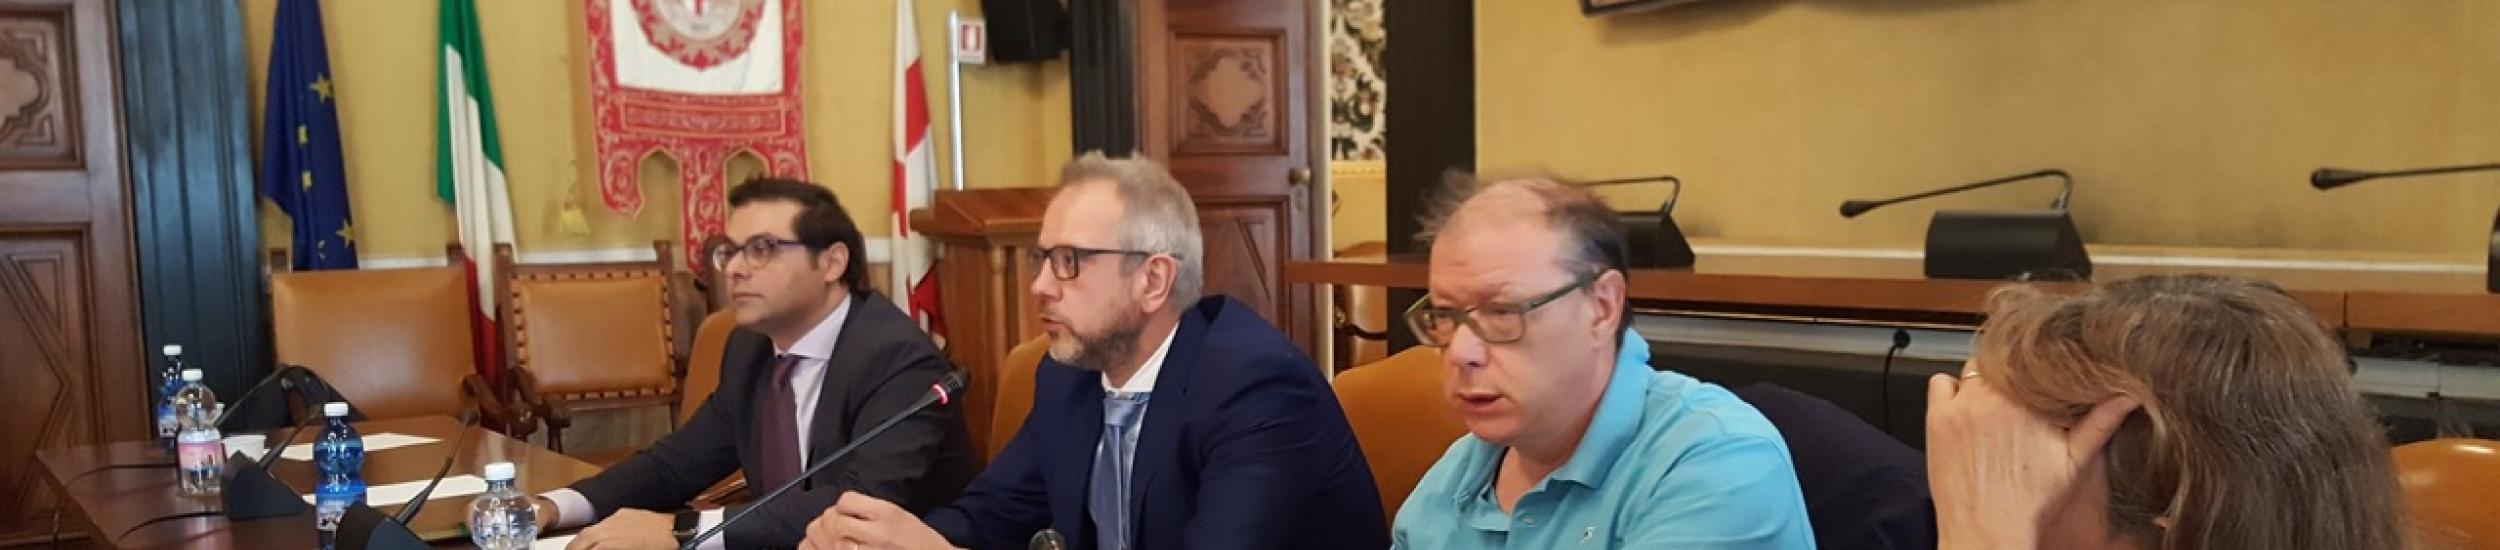 Roberto Cella durante un convegno